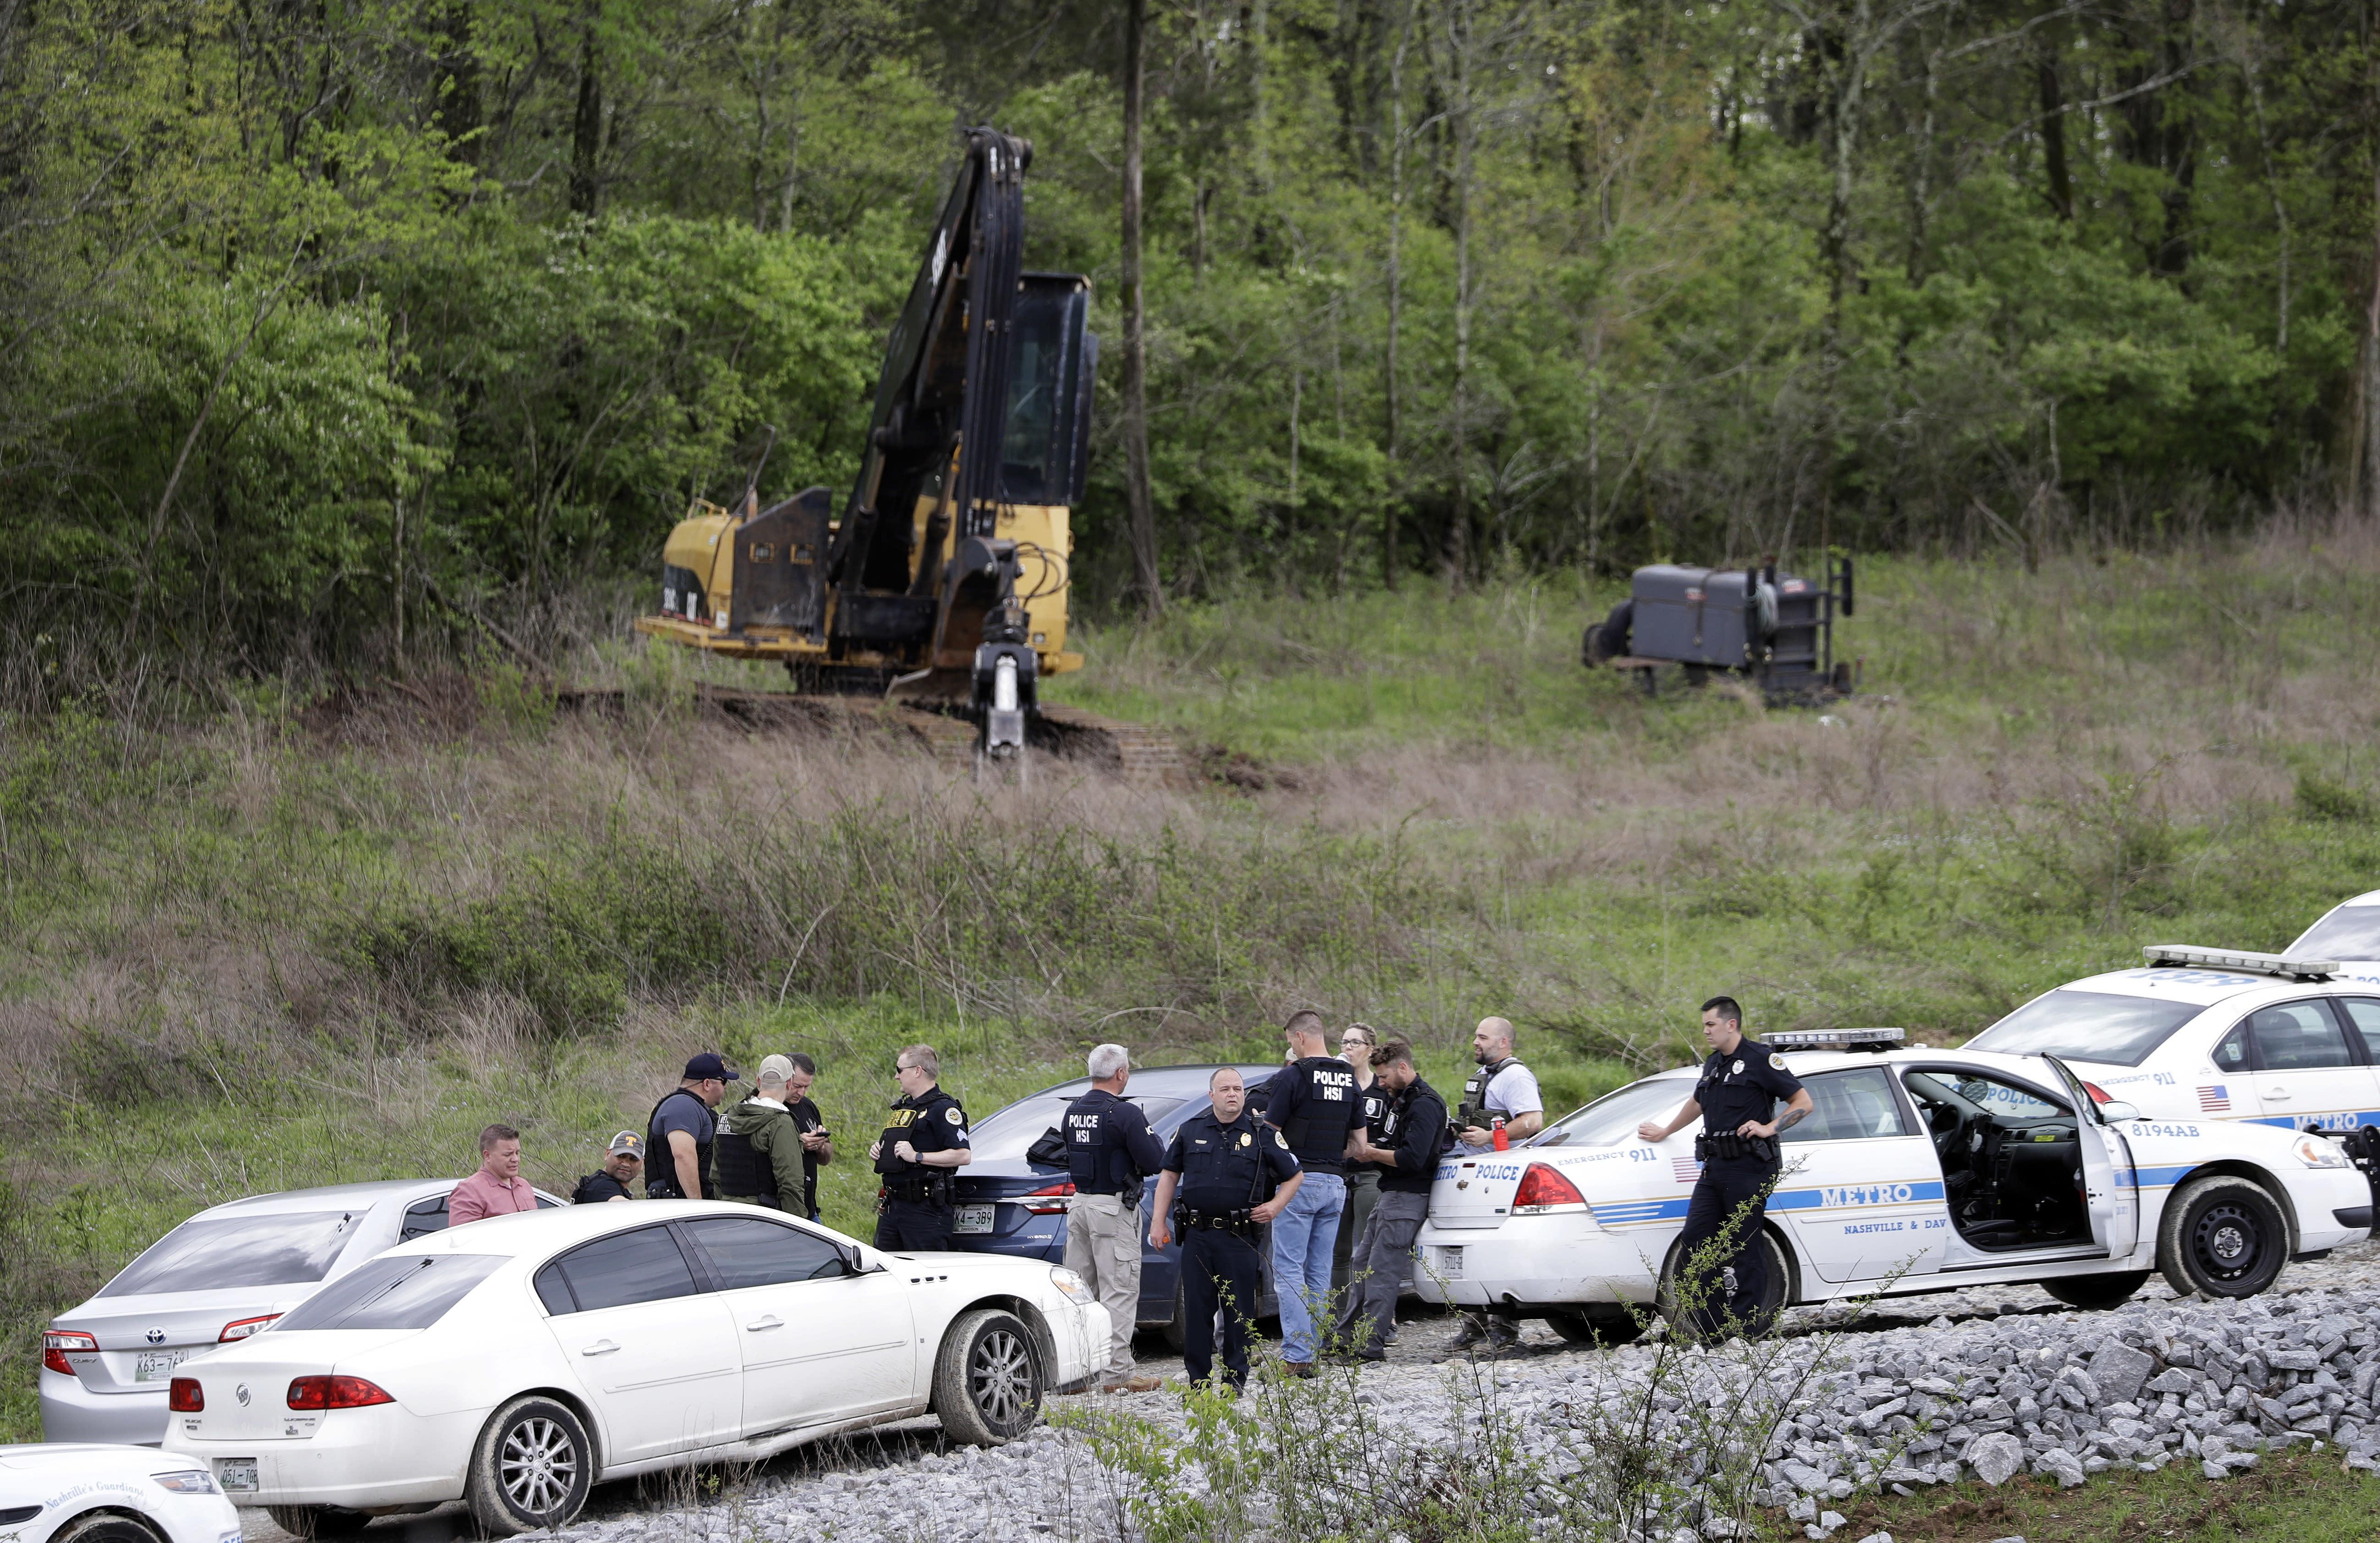 Nude gunman kills four at Tennessee waffle house - World News